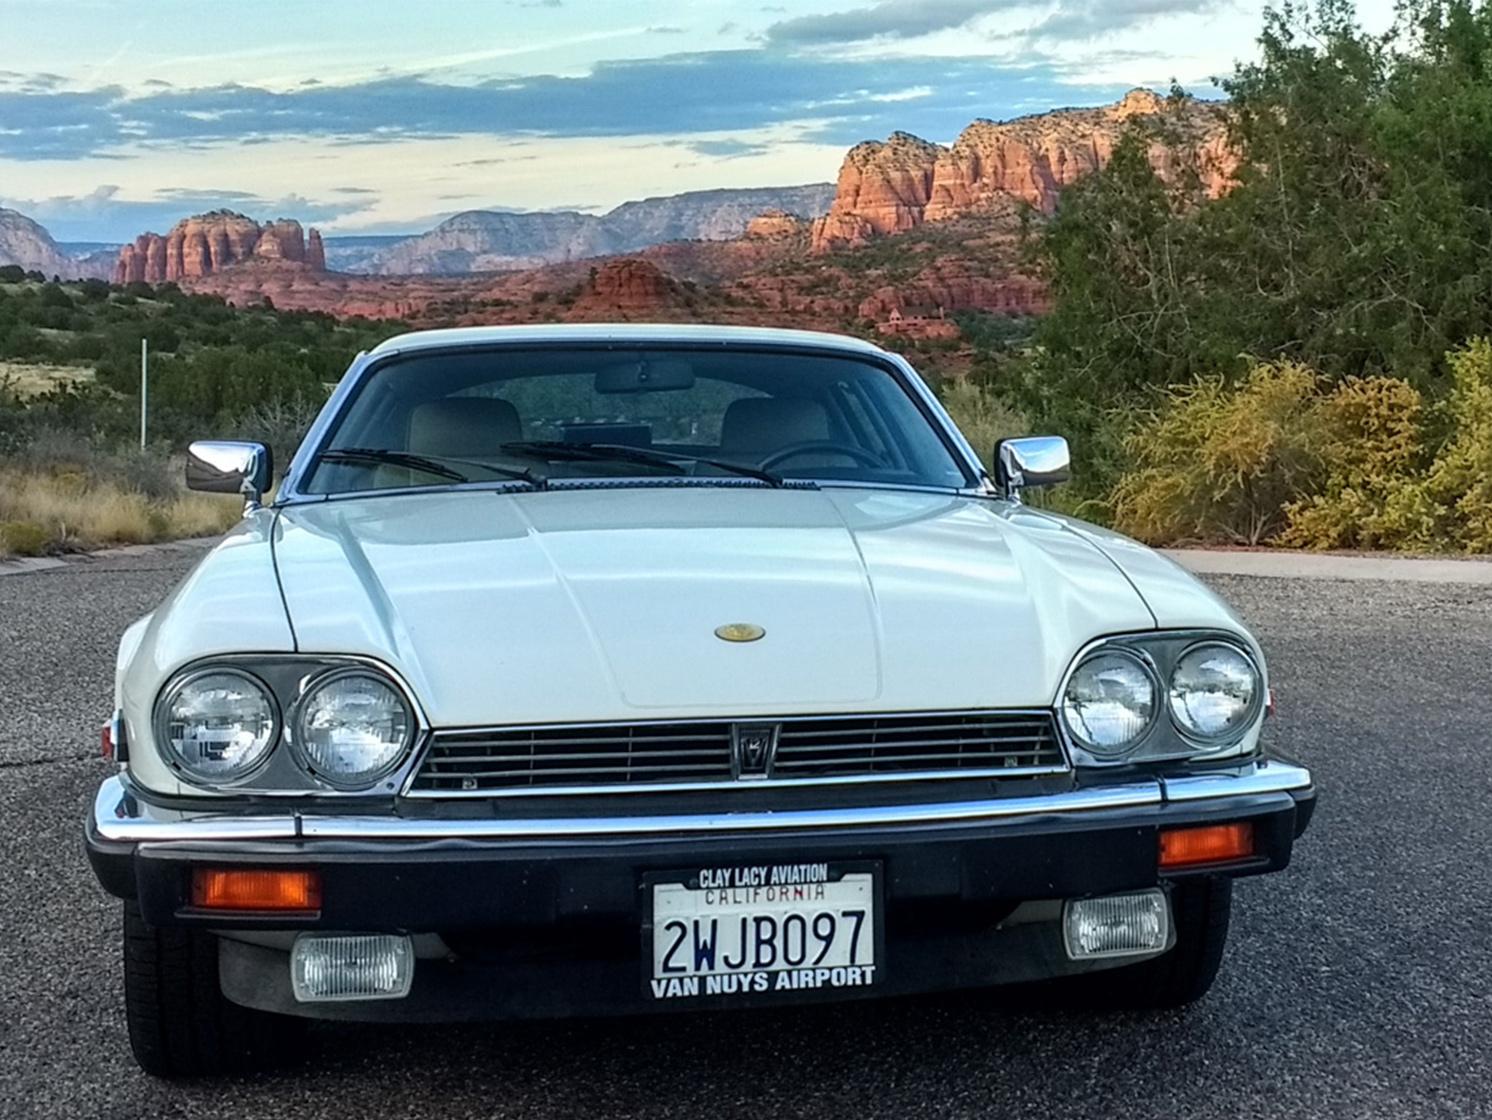 1990 Jaguar Xjs Wiring Diagram Pdf Free Diagrams Cruising In A Is Sublime At